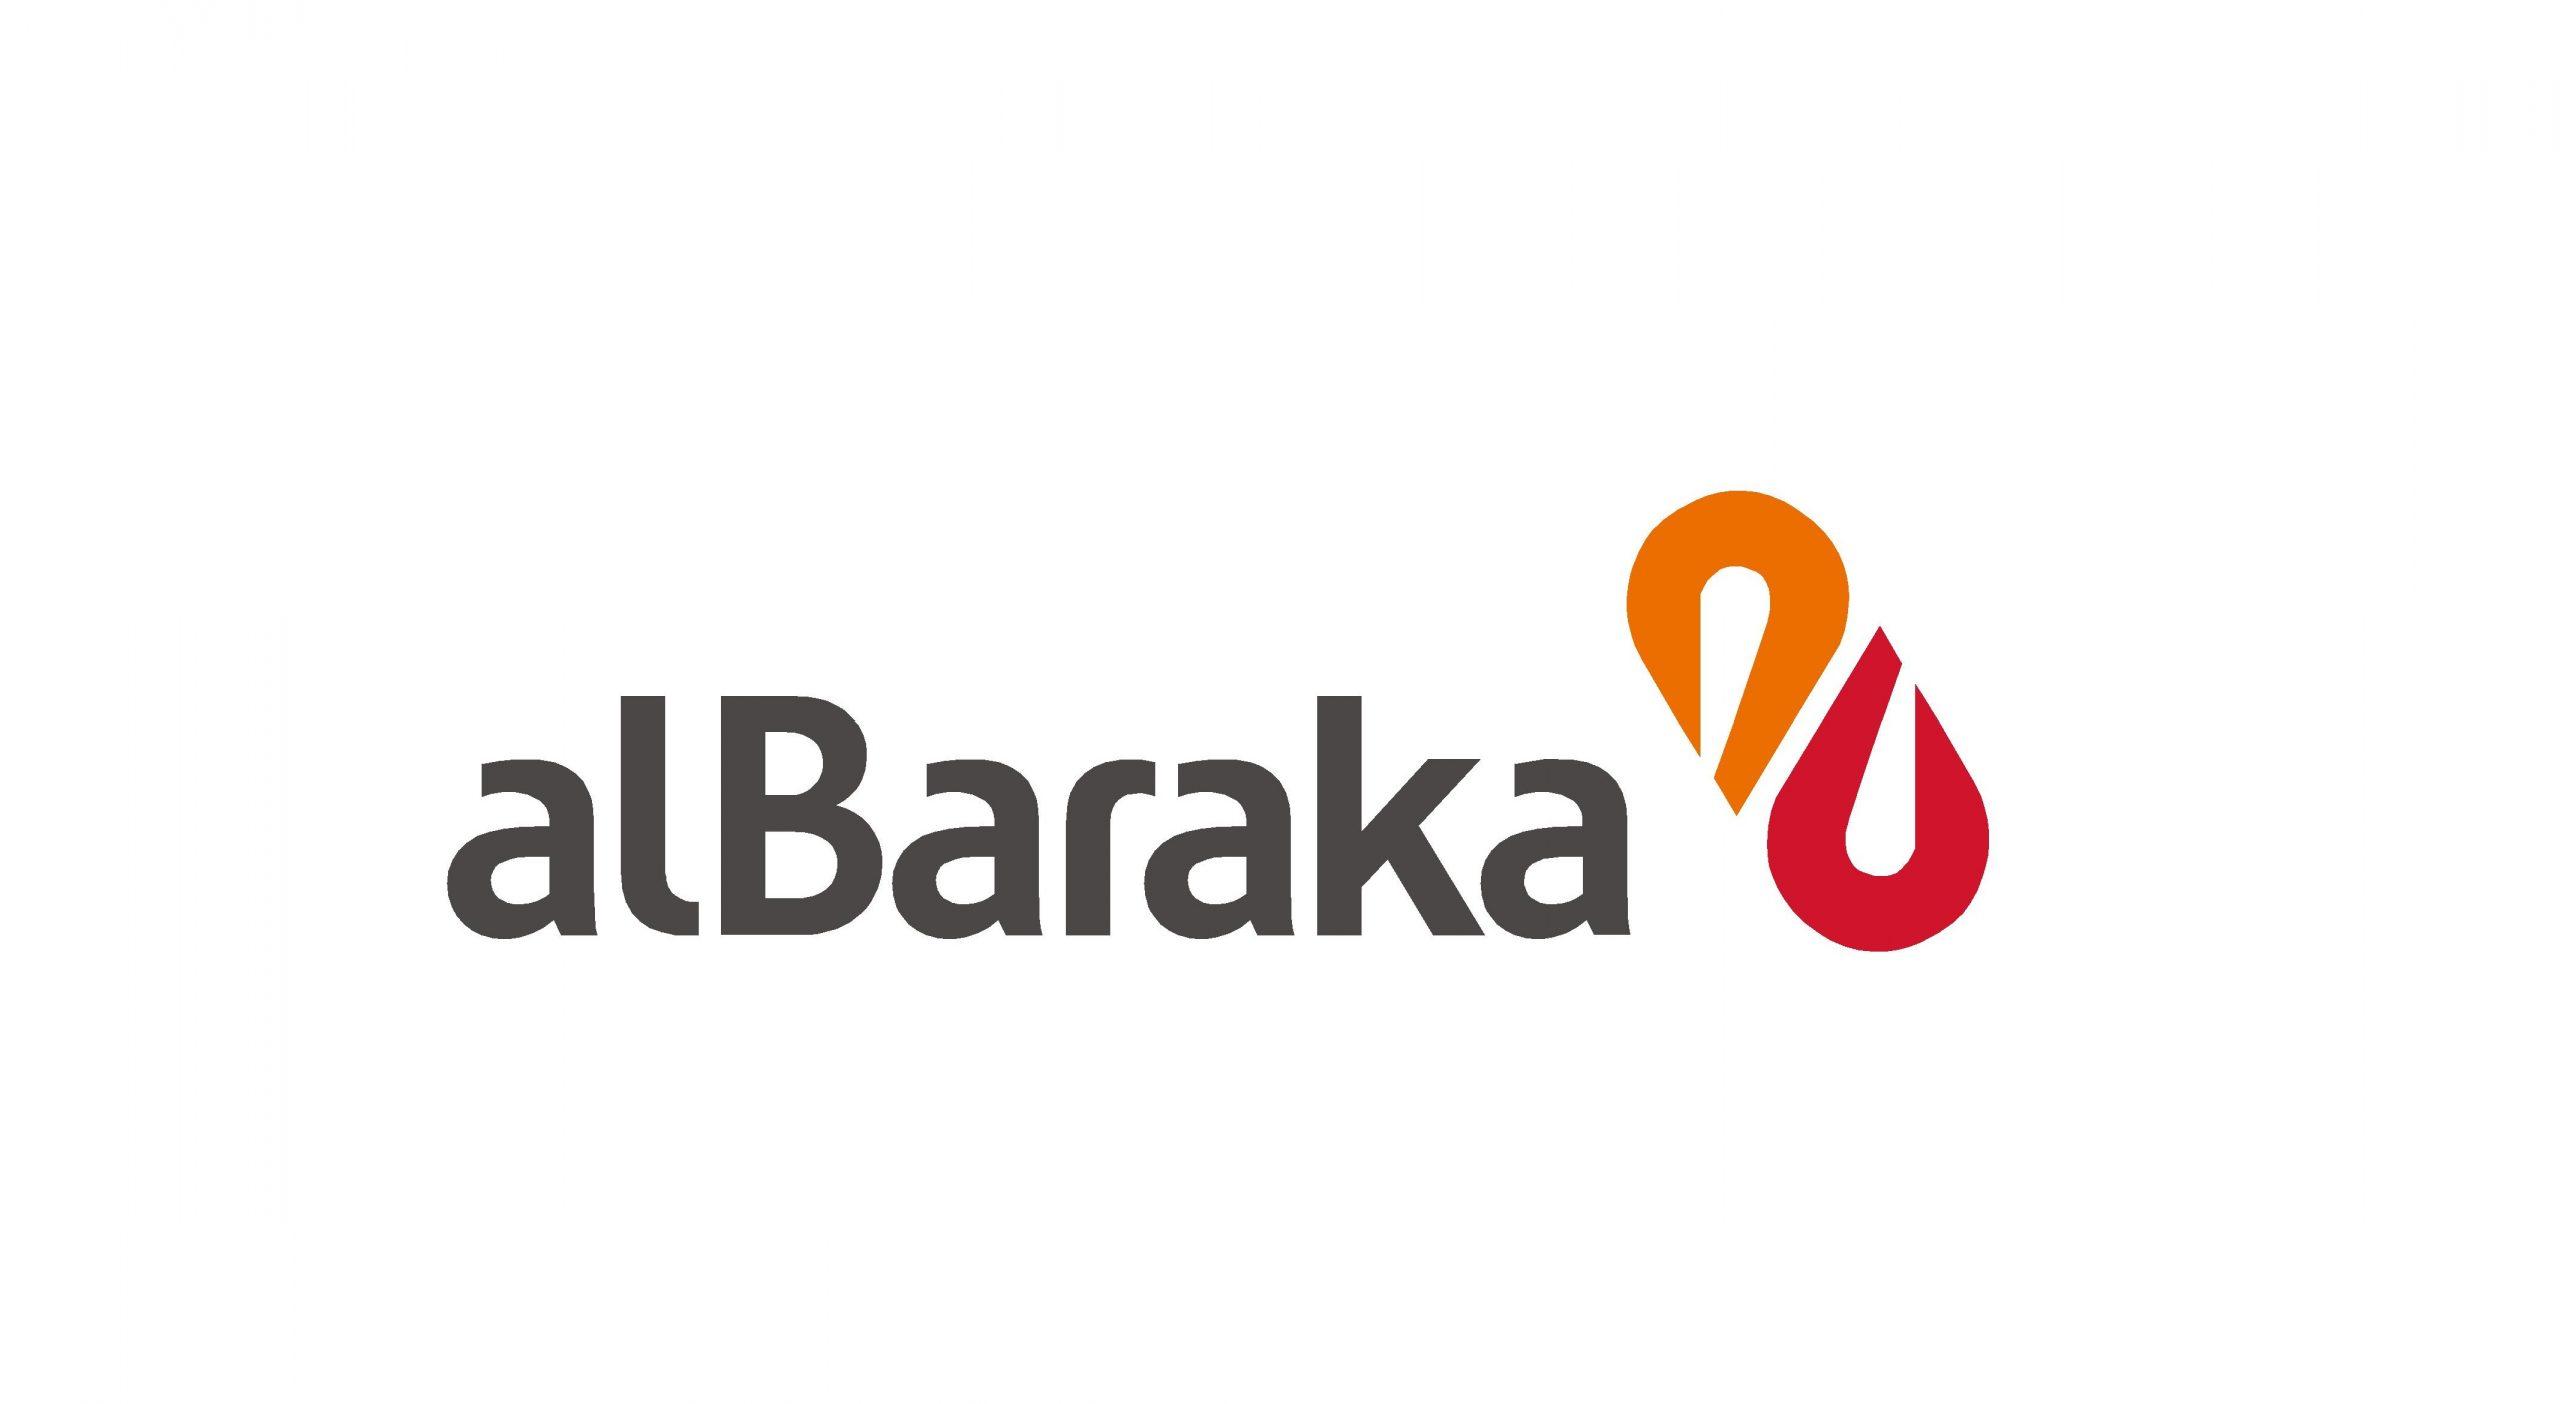 Albaraka-Türk-Logo-scaled